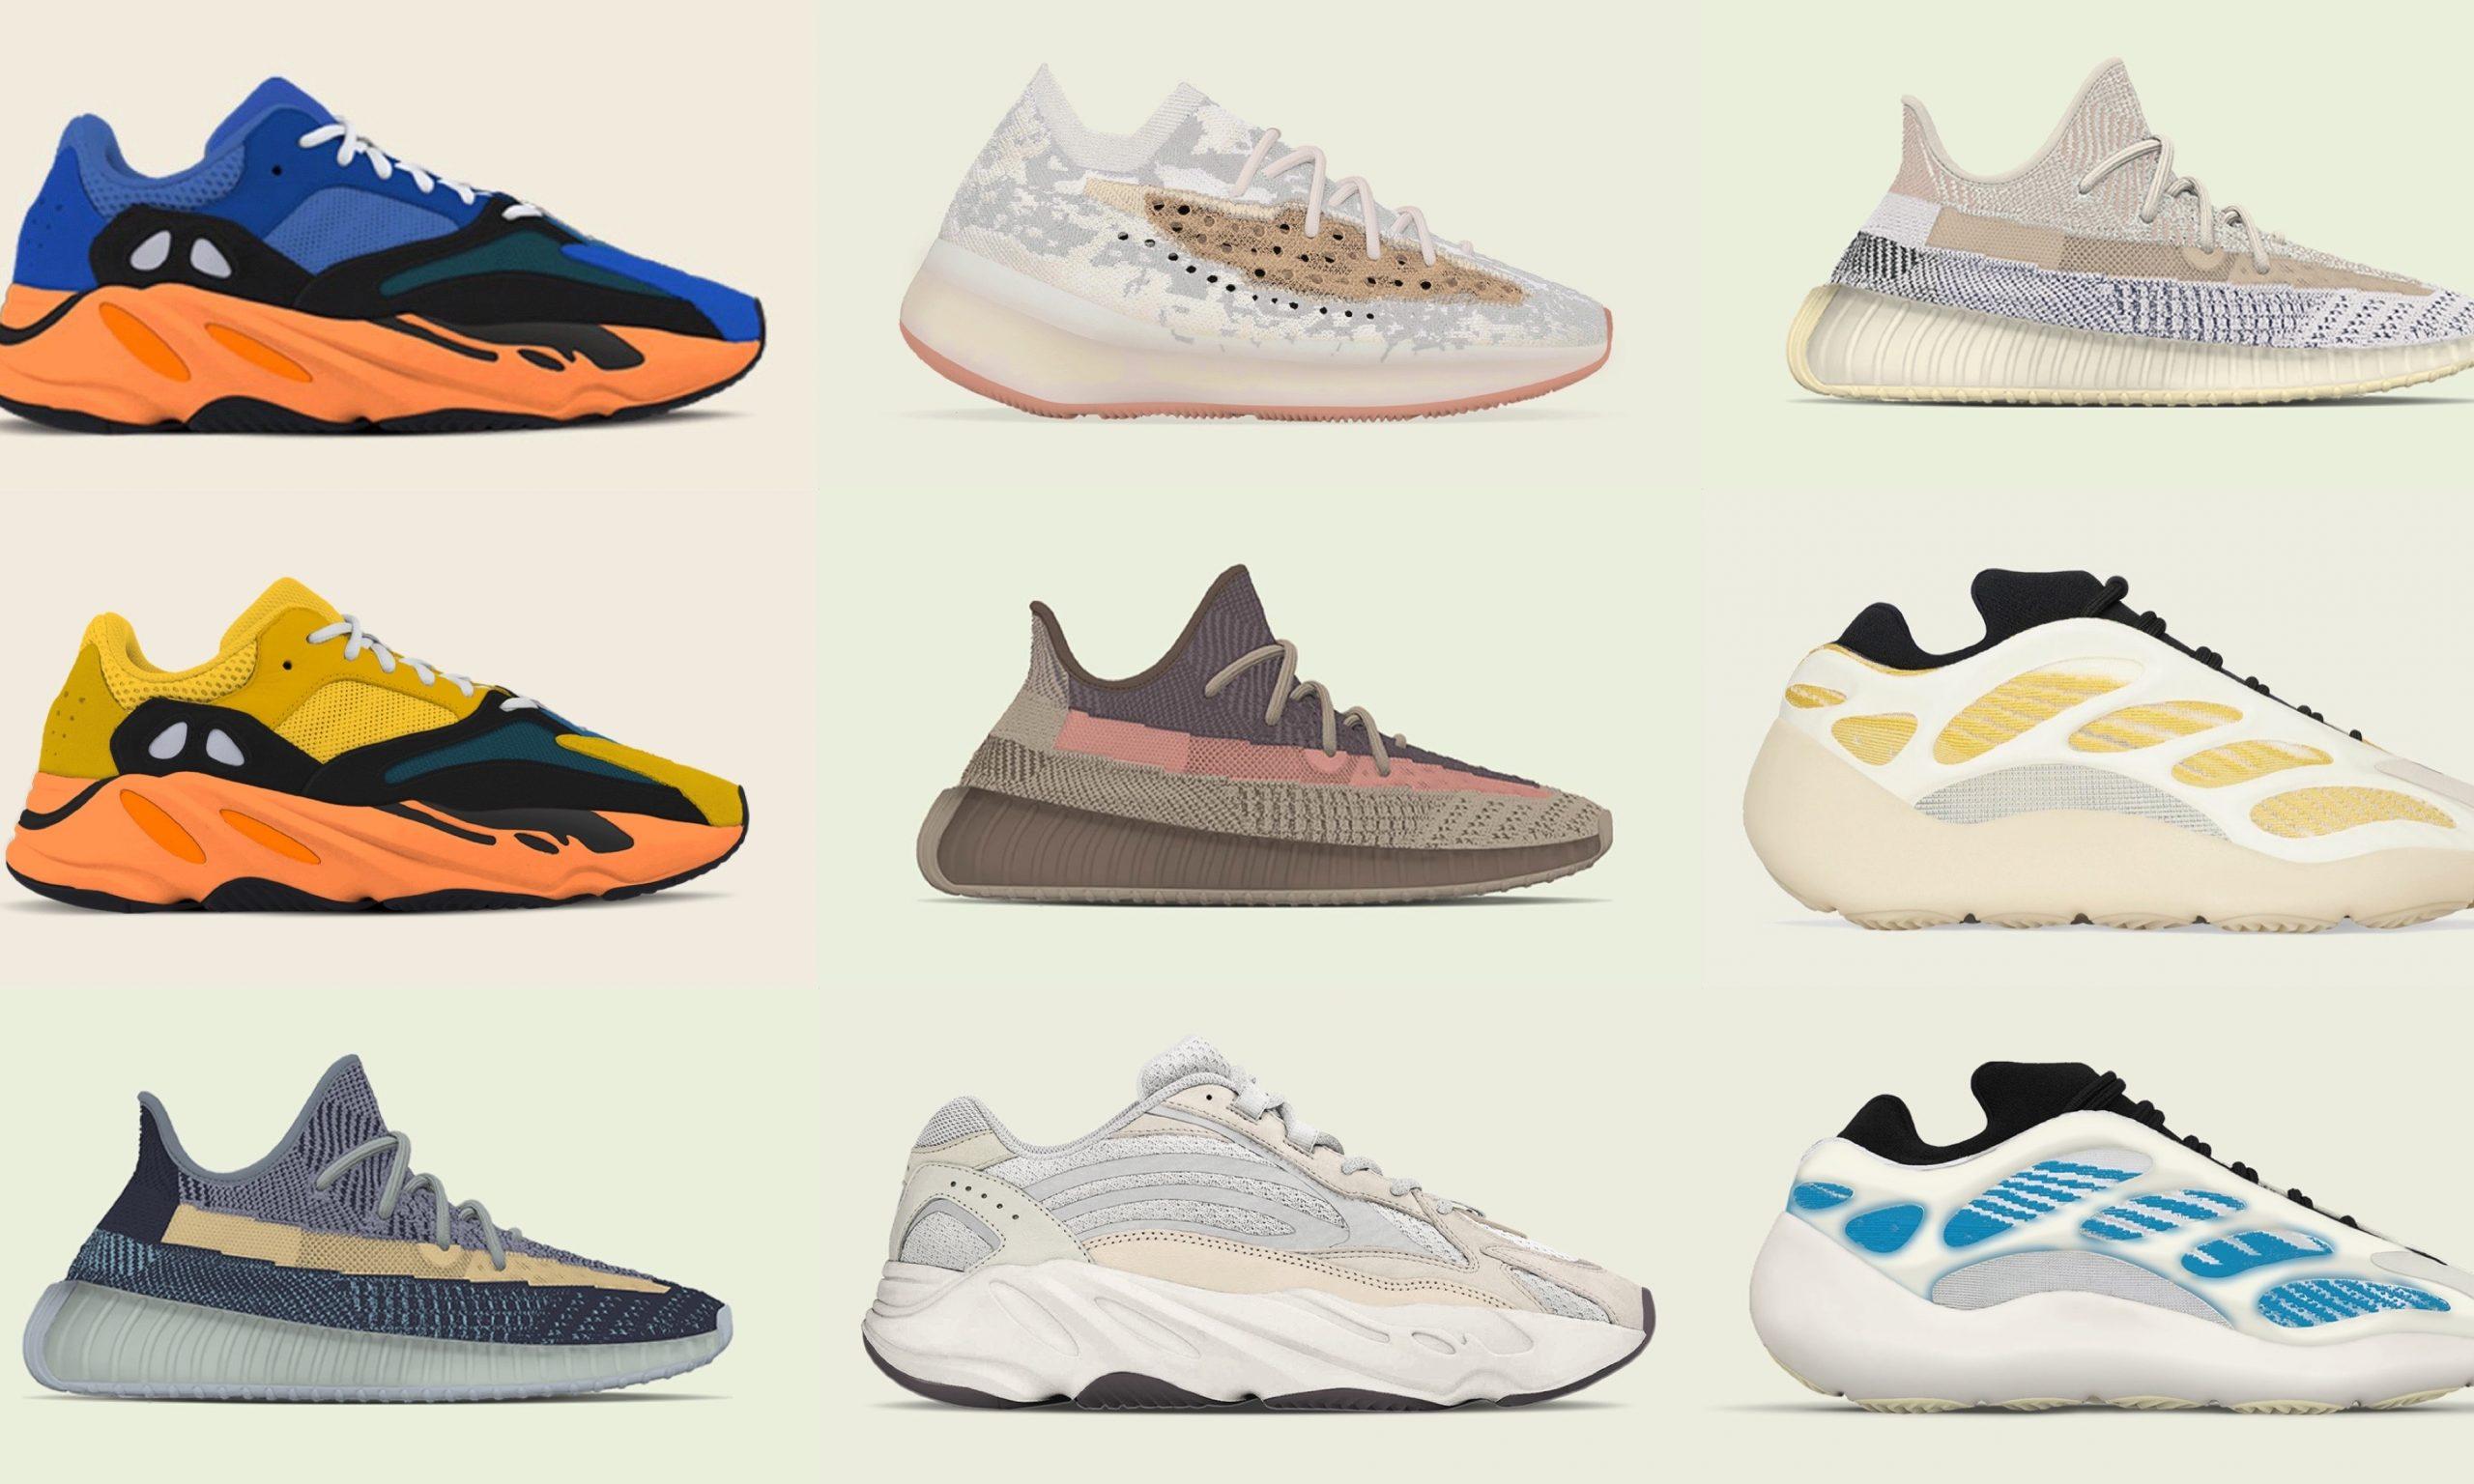 adidas Yeezy 2021 年发售计划清单先览